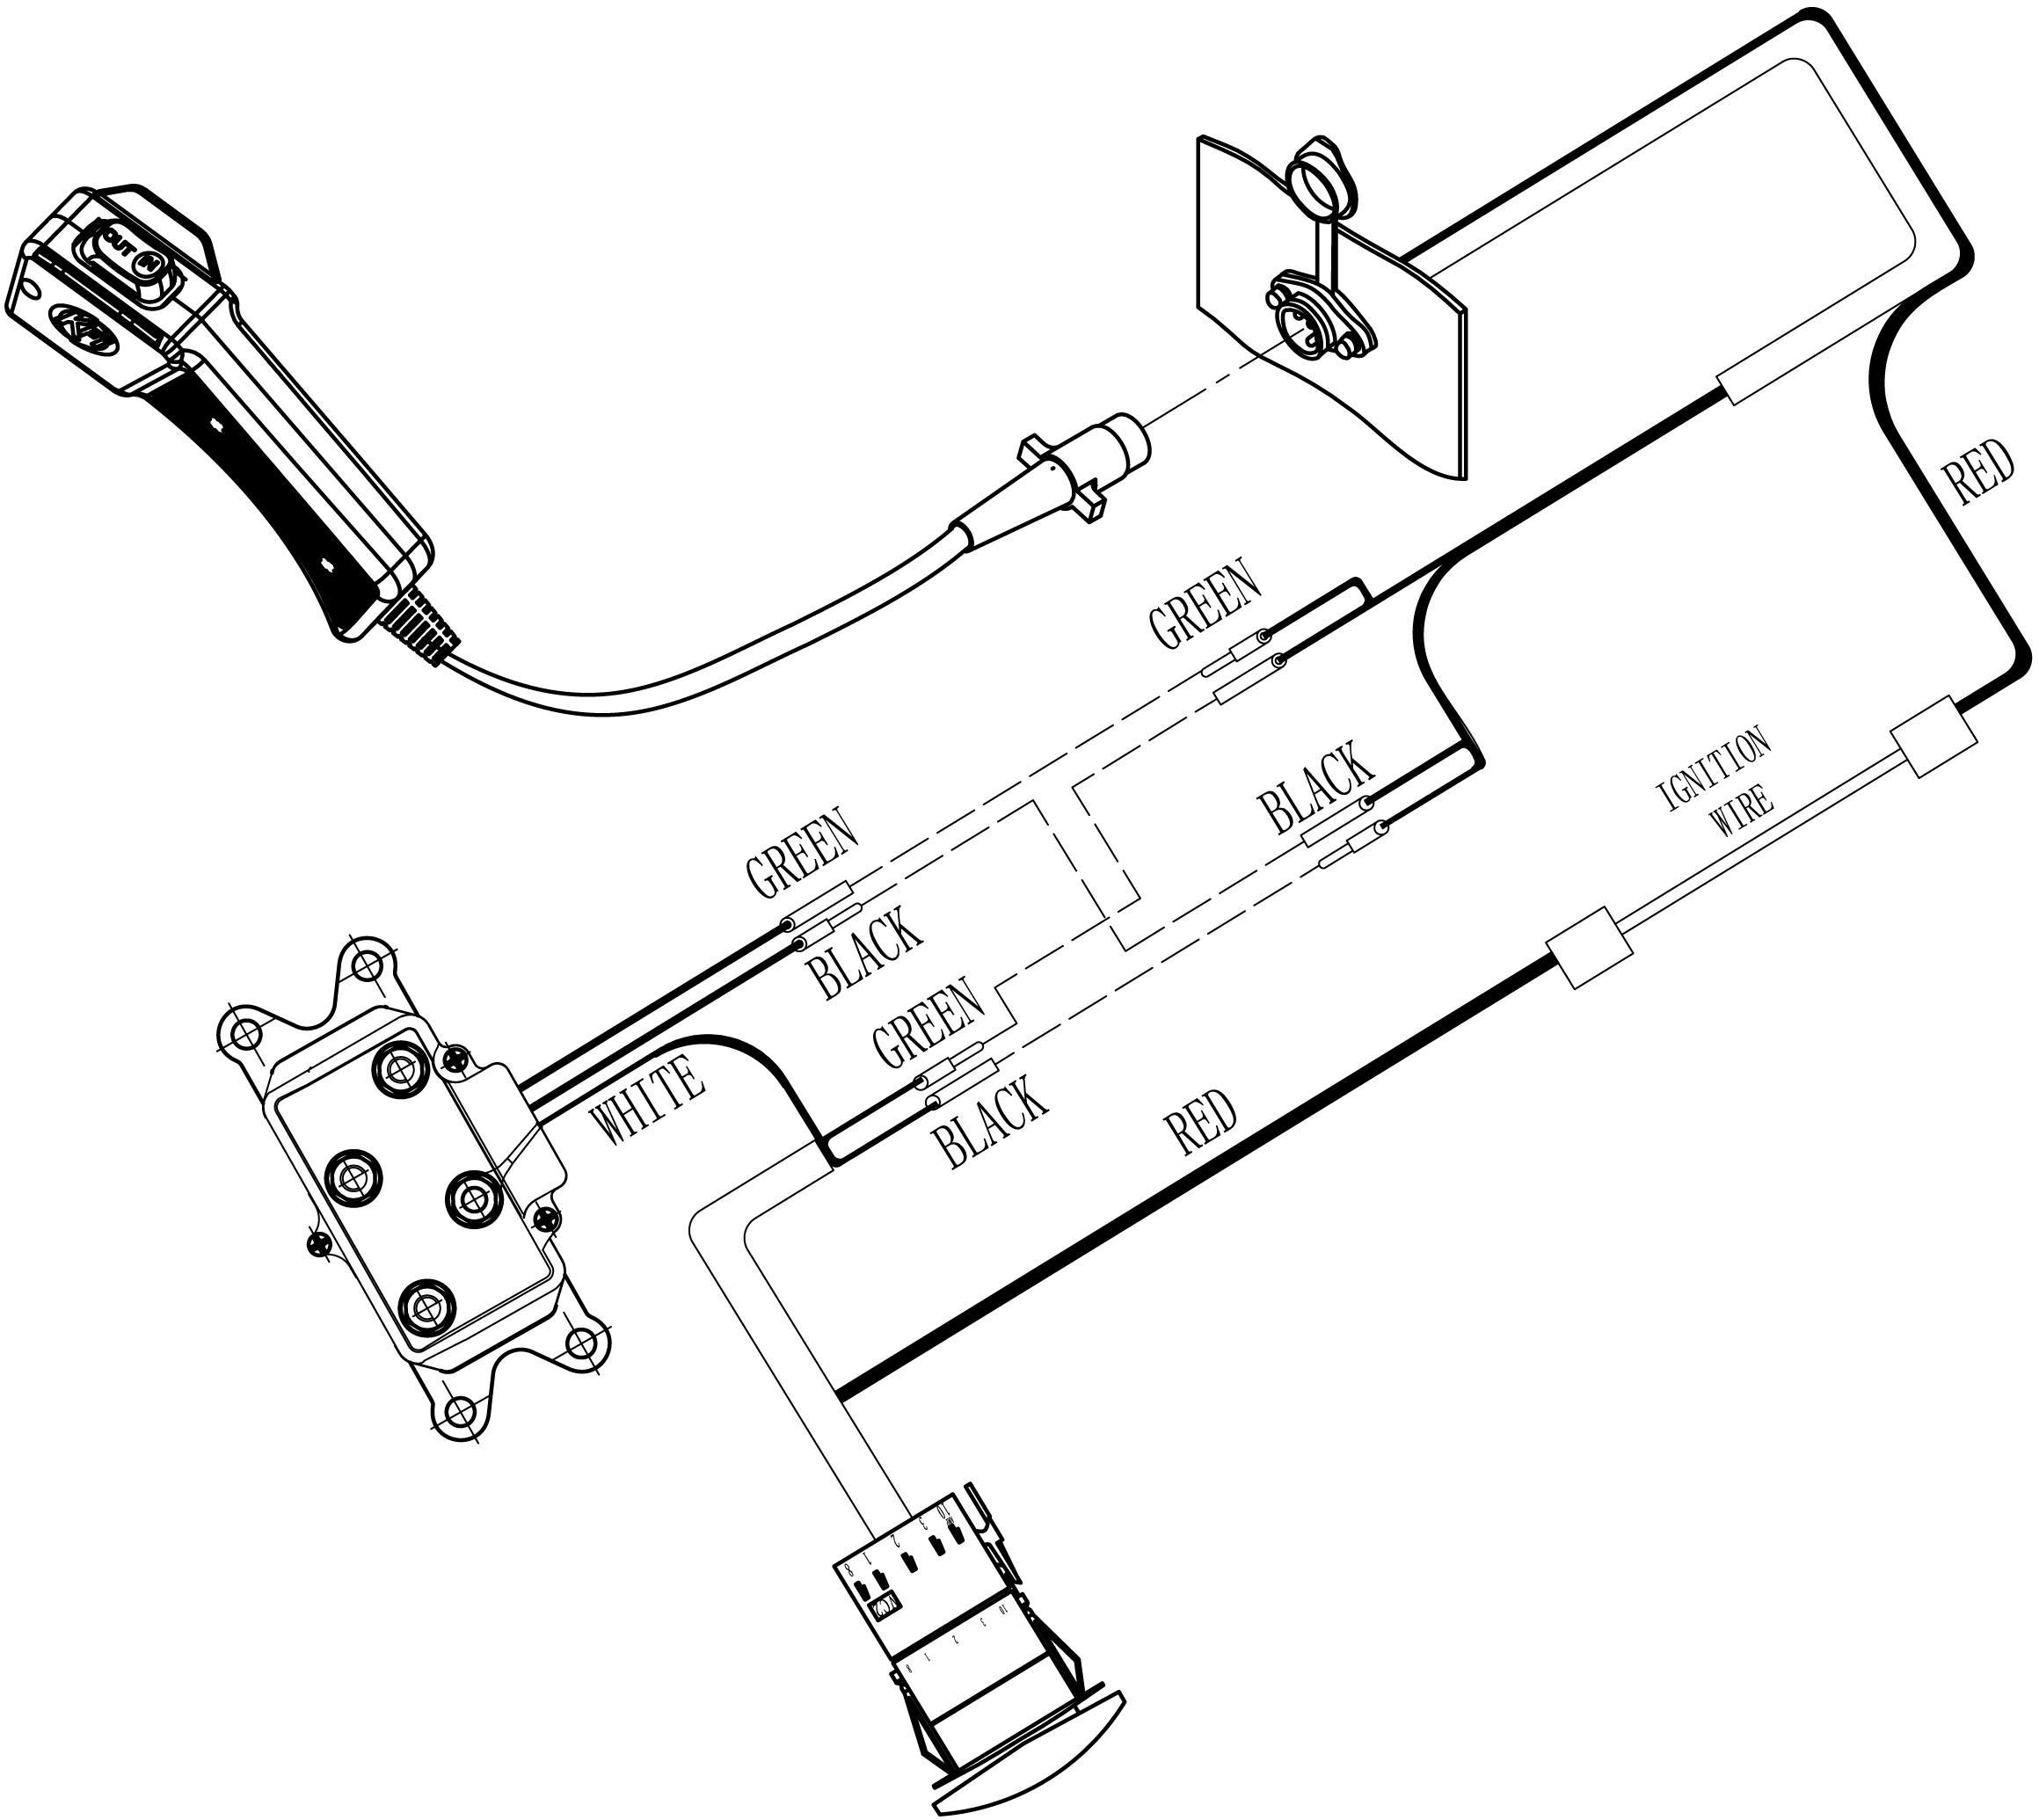 Traveler Remote Winch Control Diagram Ve 9742] Quadboss Winch solenoid Wiring Diagram Free Diagram Of Traveler Remote Winch Control Diagram